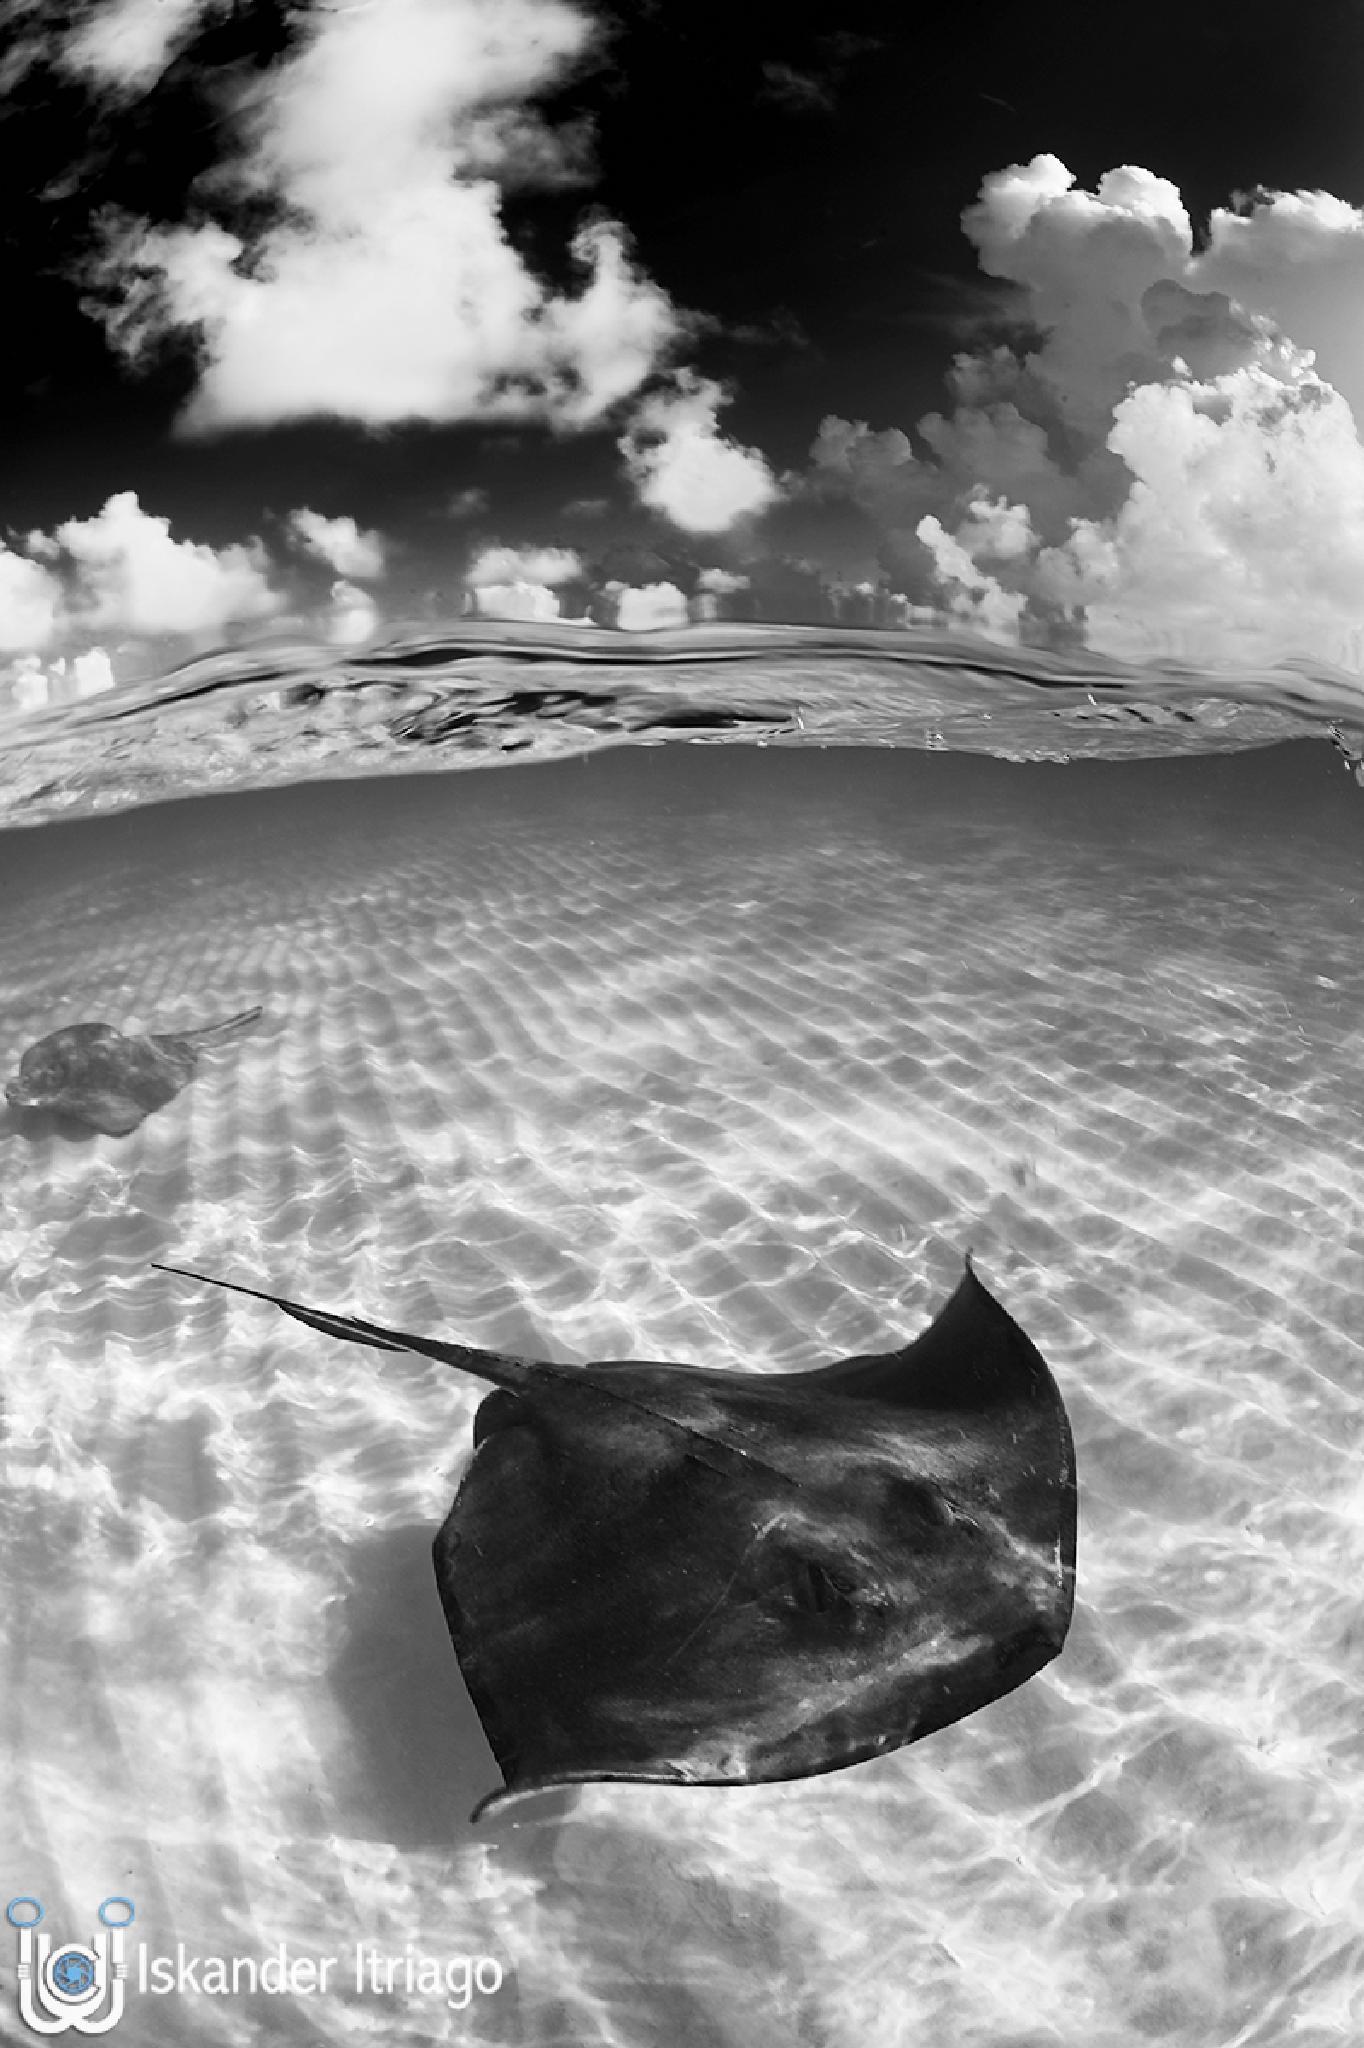 Over/Under Sand Bar by IskanderItriago